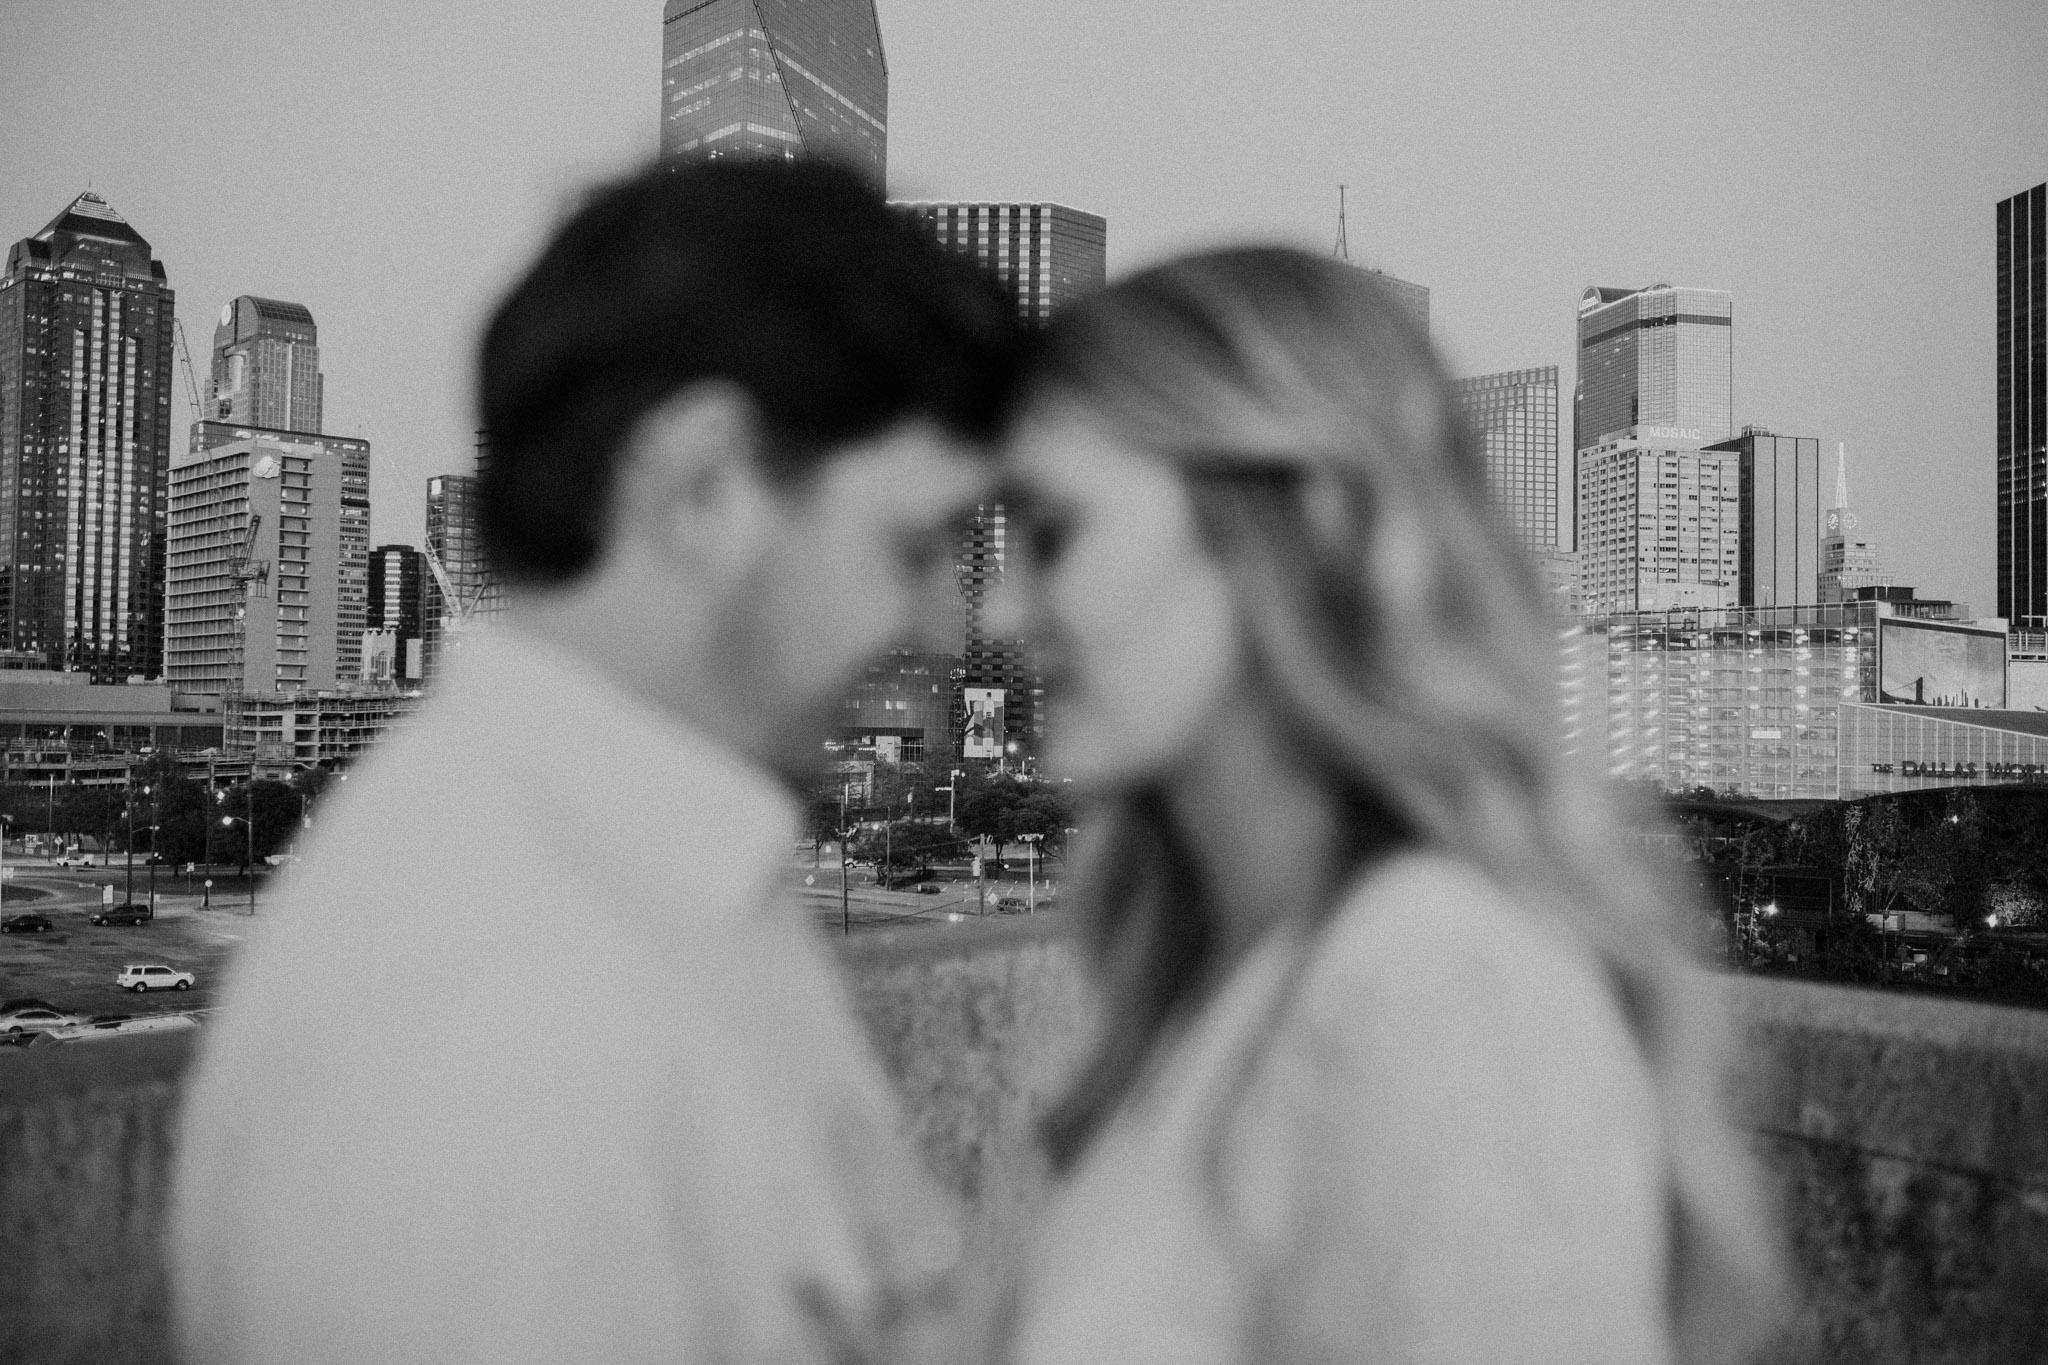 Angelle&Charlie_DFW_Wedding_Photography_31.jpg